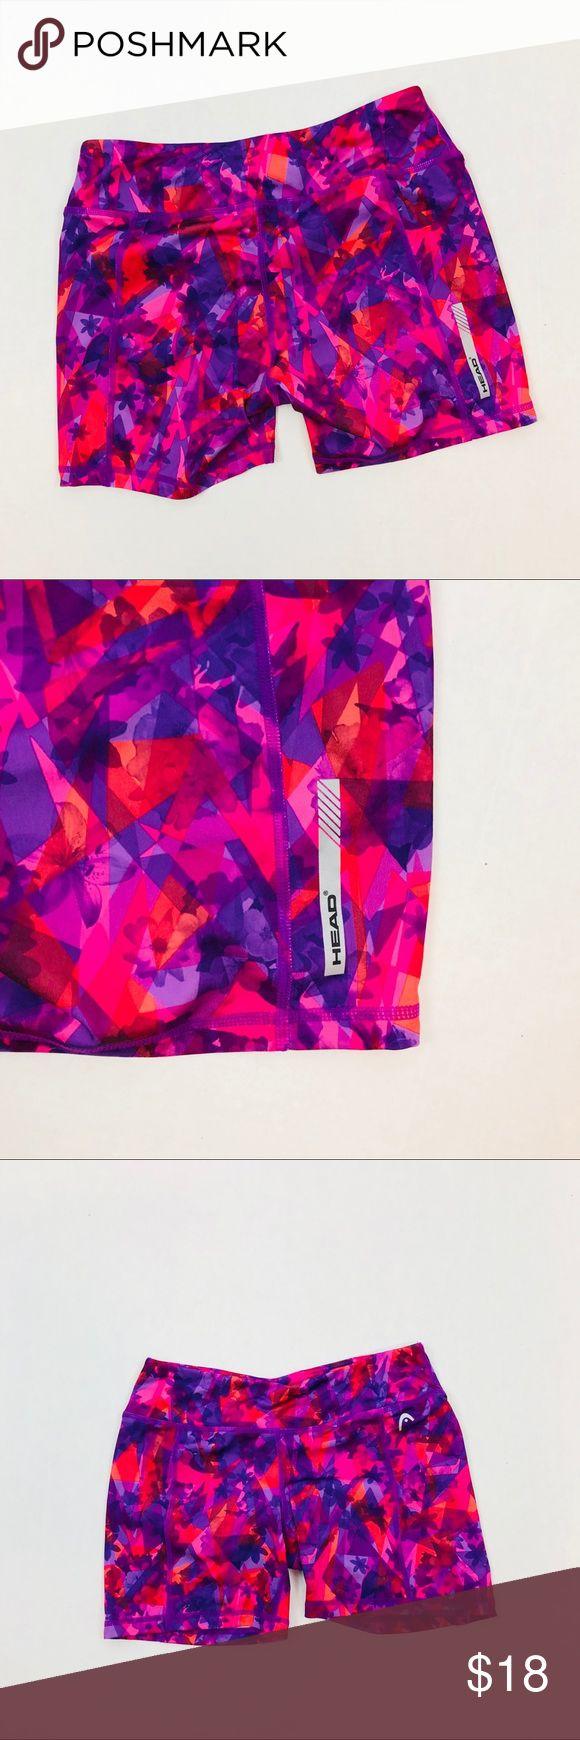 "HEAD Women's Tachisme Print Studio Shorts Size S Amazing Print HEAD running short. Size Small Waist:13"" Inseam:5"" Head Shorts"